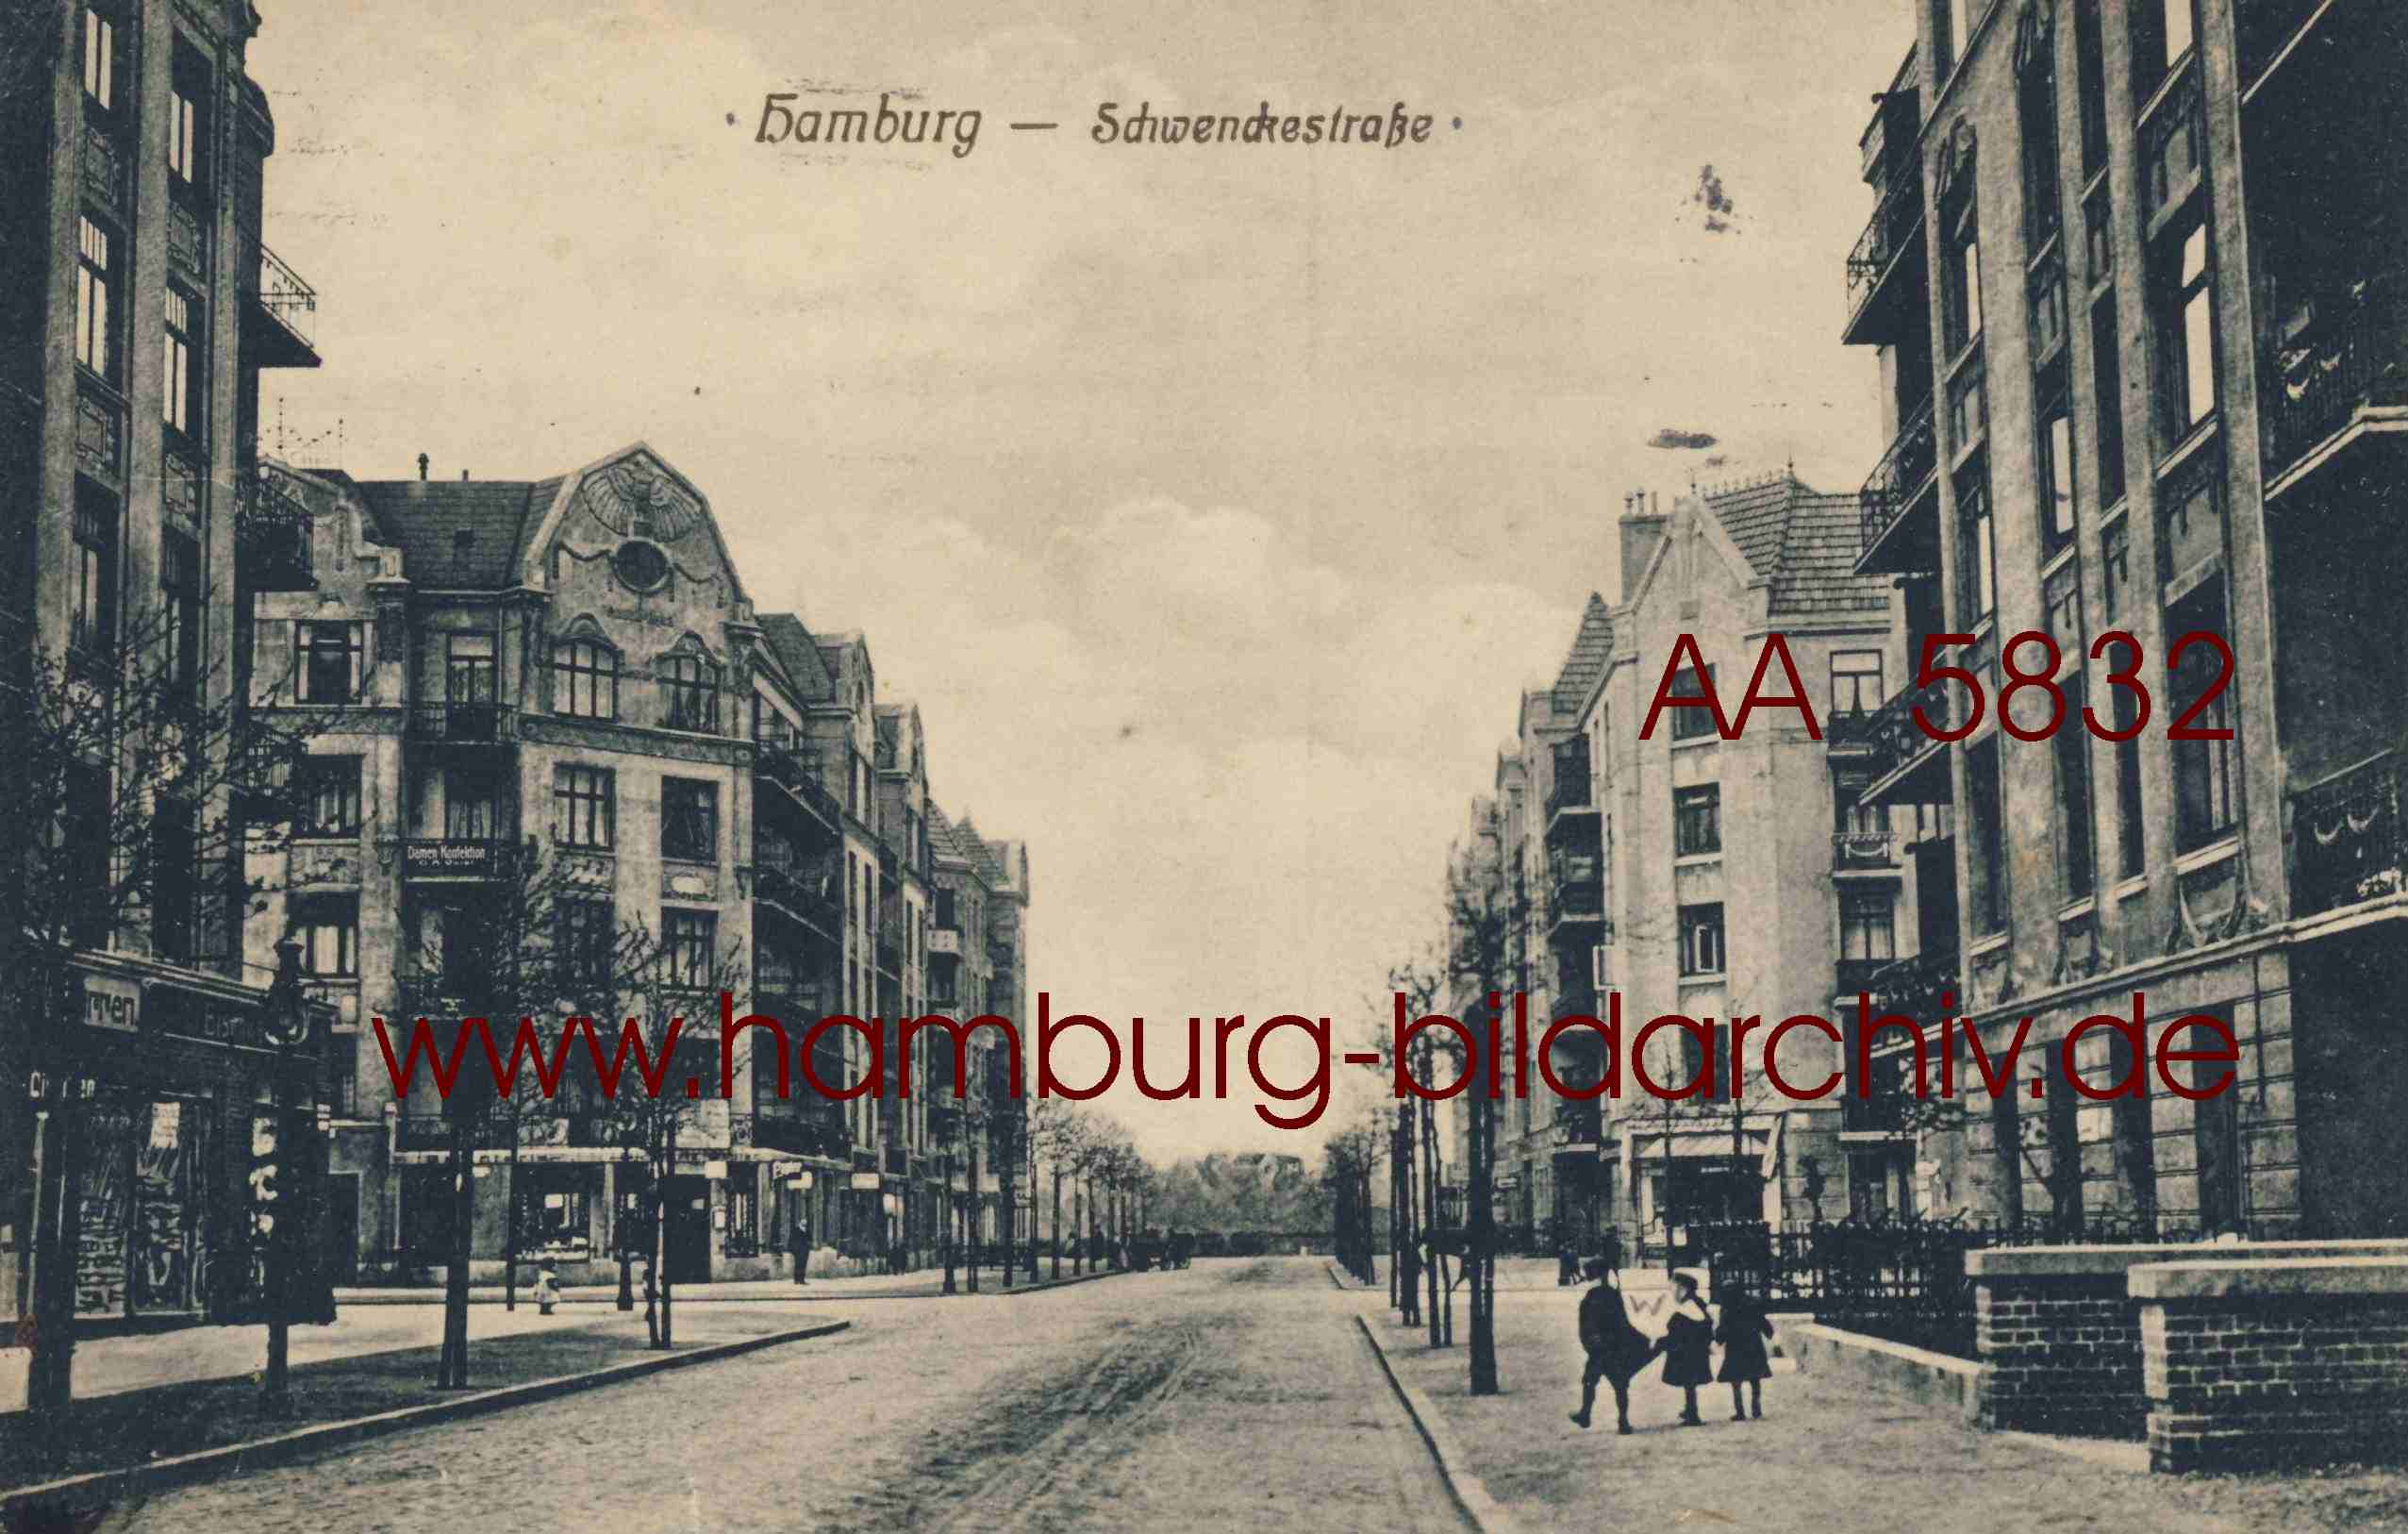 Schwenckestraße